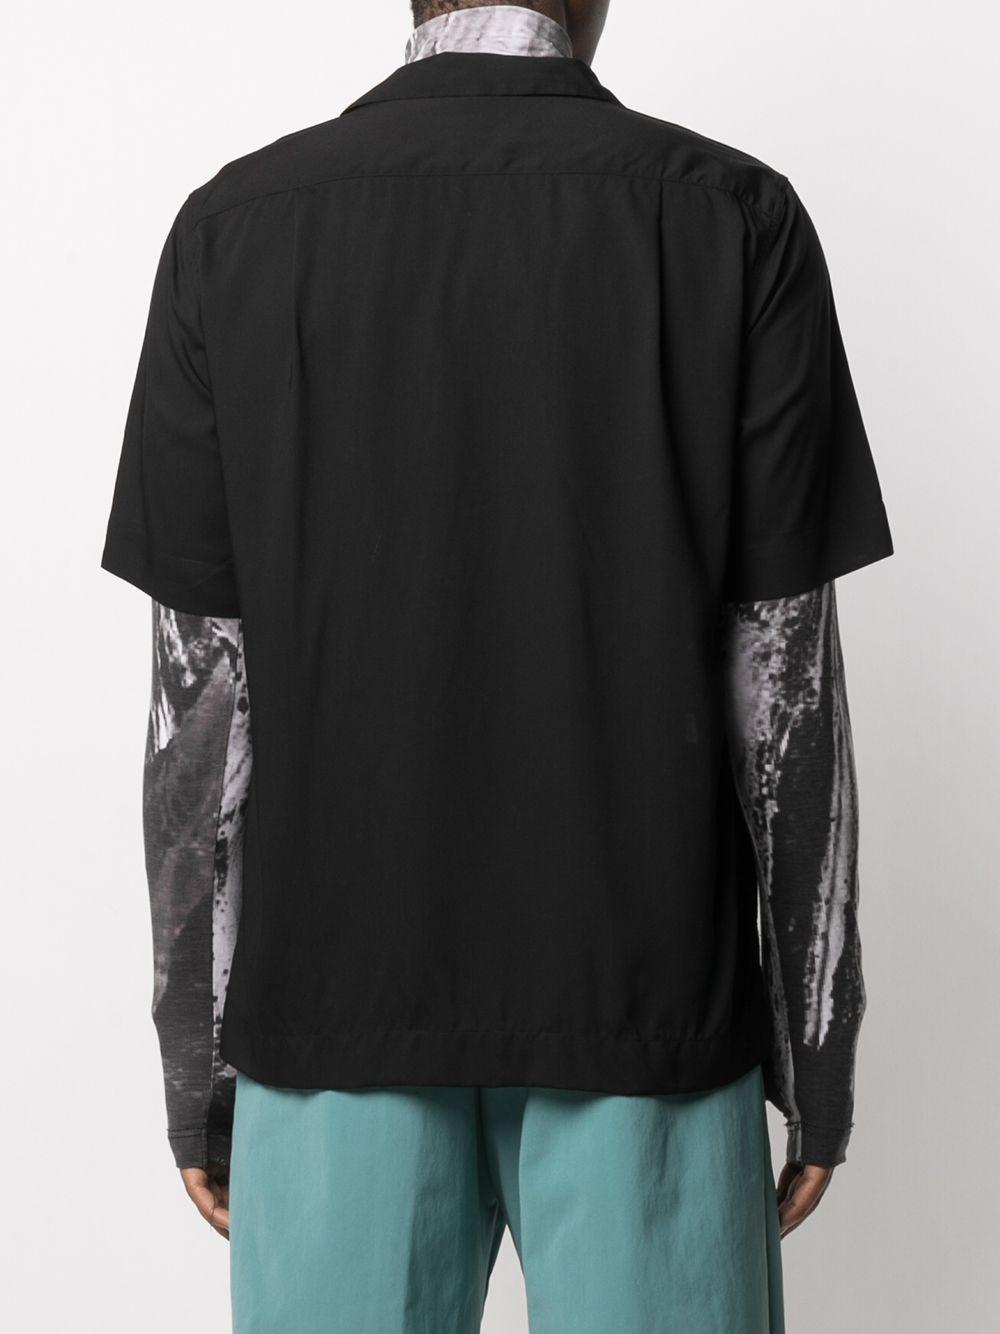 CARLTONE SHIRT DRIES VAN NOTEN | Shirts | CARLTONE2304